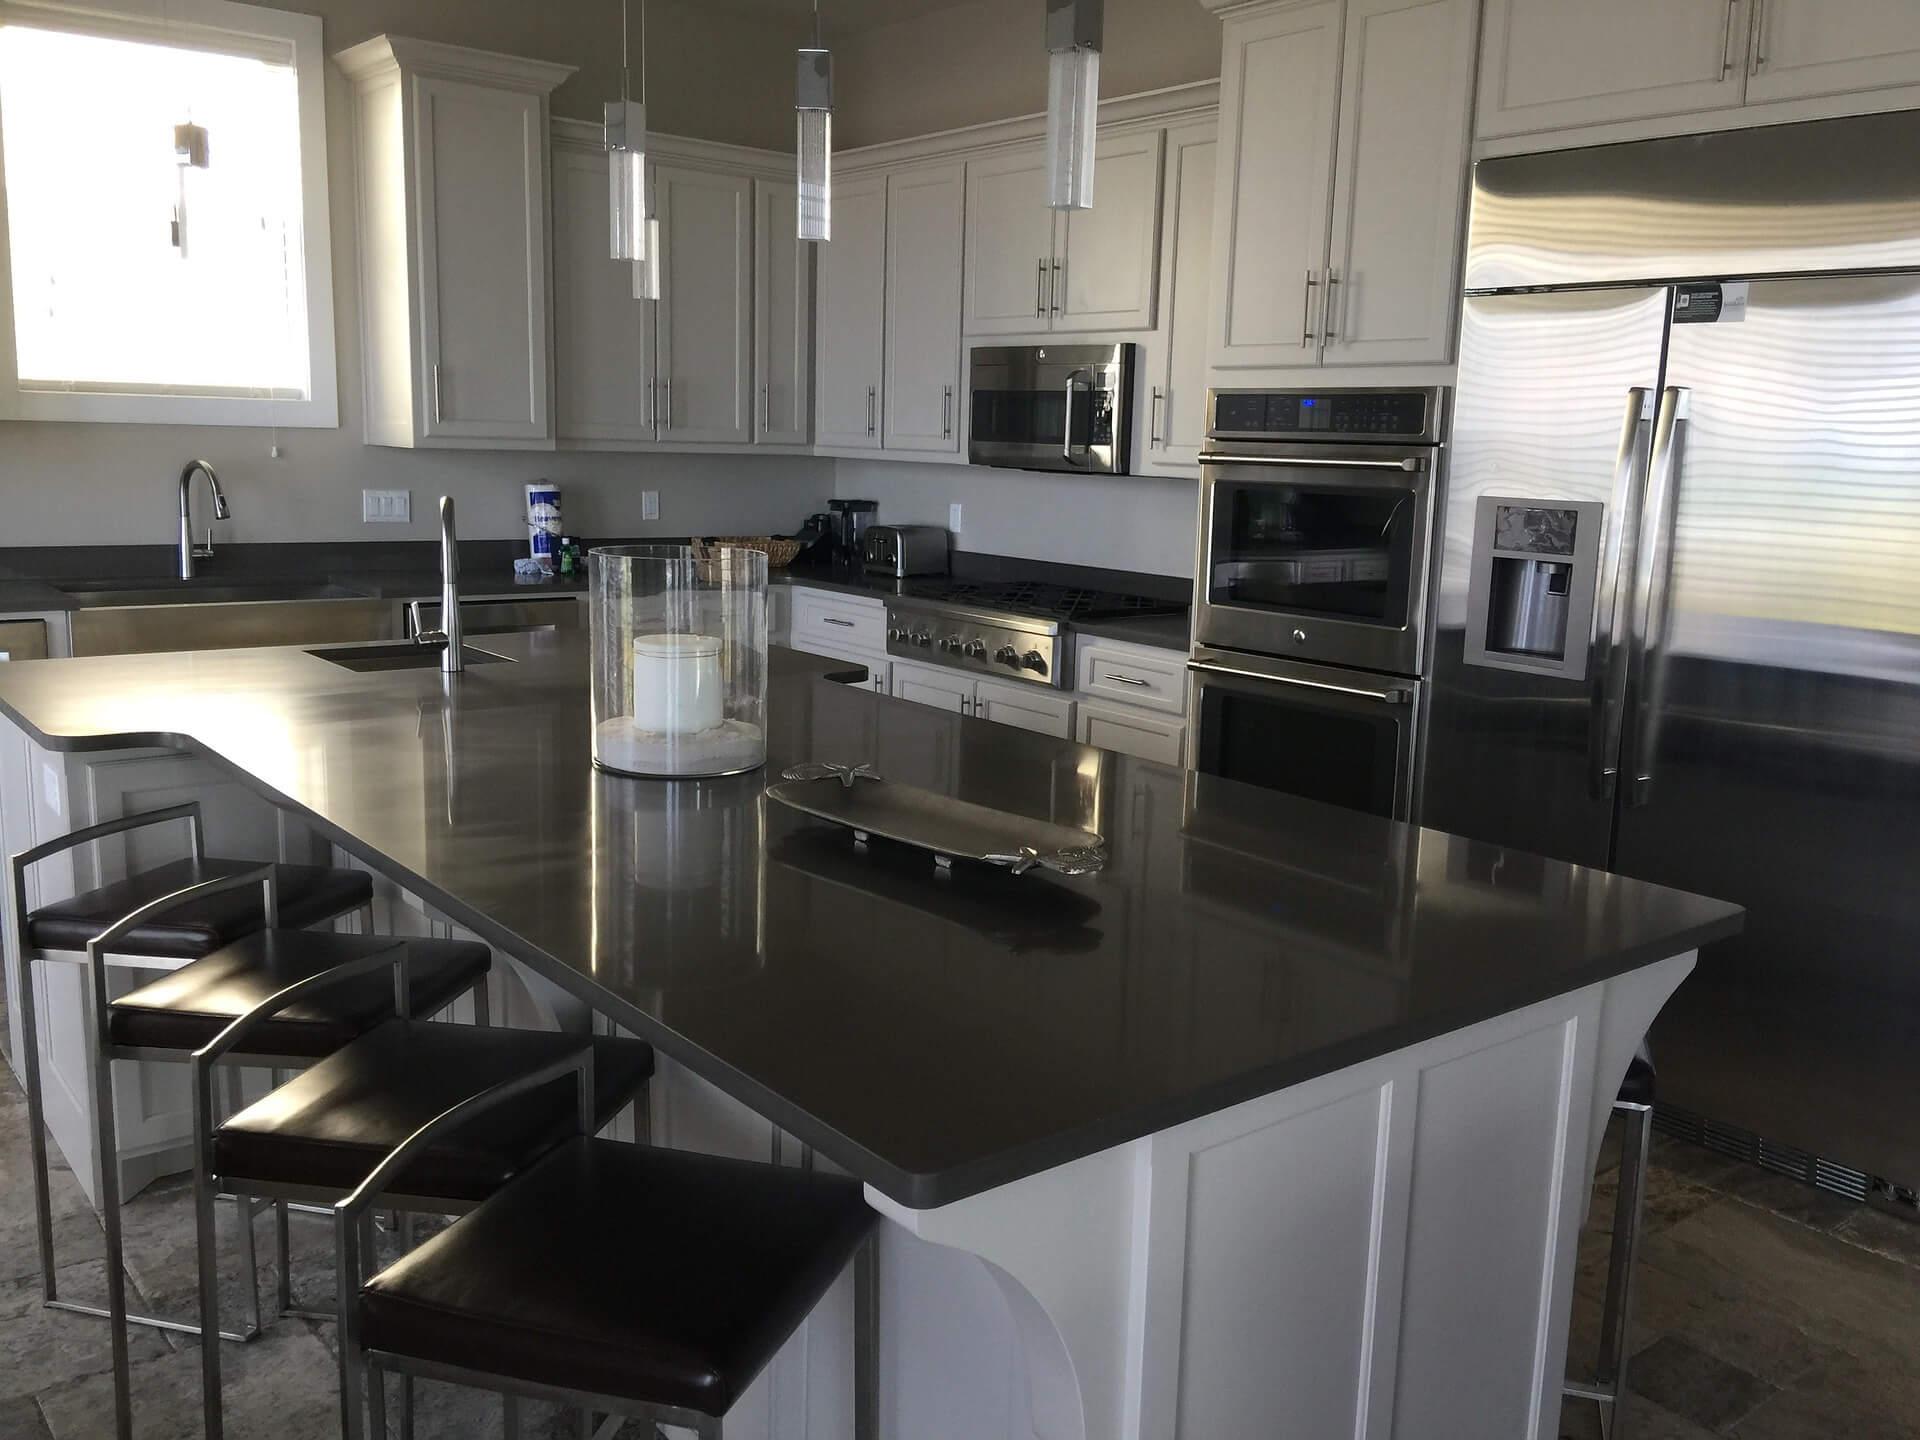 Complete Kitchen Renovations - SoFlo Kitchen Remodeling & Custom Cabinet Installation - backsplashes, flooring, countertops